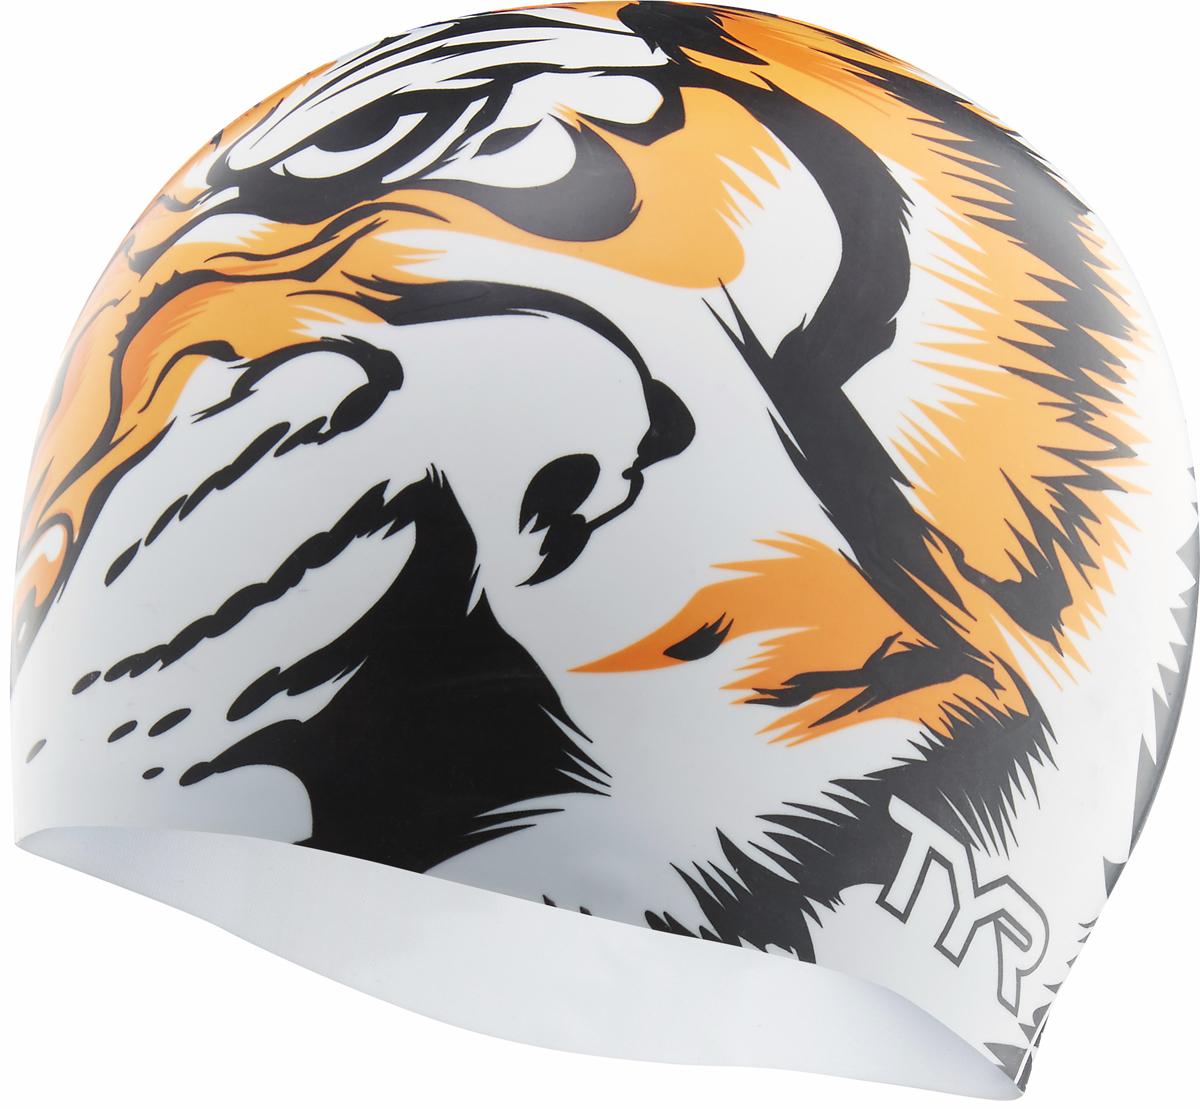 Шапочка для плавания Tyr Silicone Tiger Cap, цвет: белый, оранжевый. LCSTIGER шапочка для плавания tyr sdoc